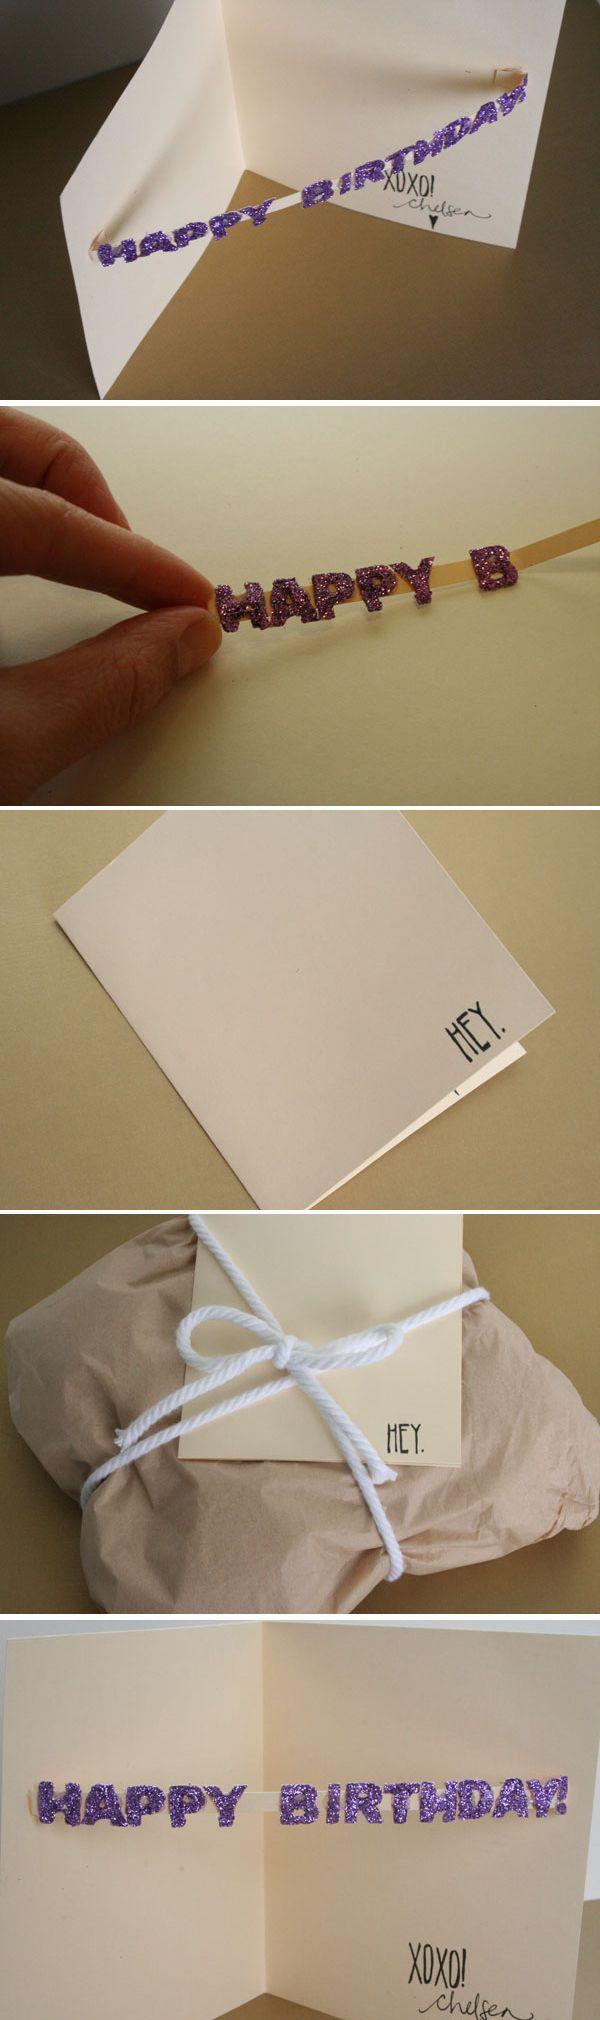 2219 Best Birthday Cards Images On Pinterest Birthdays Card